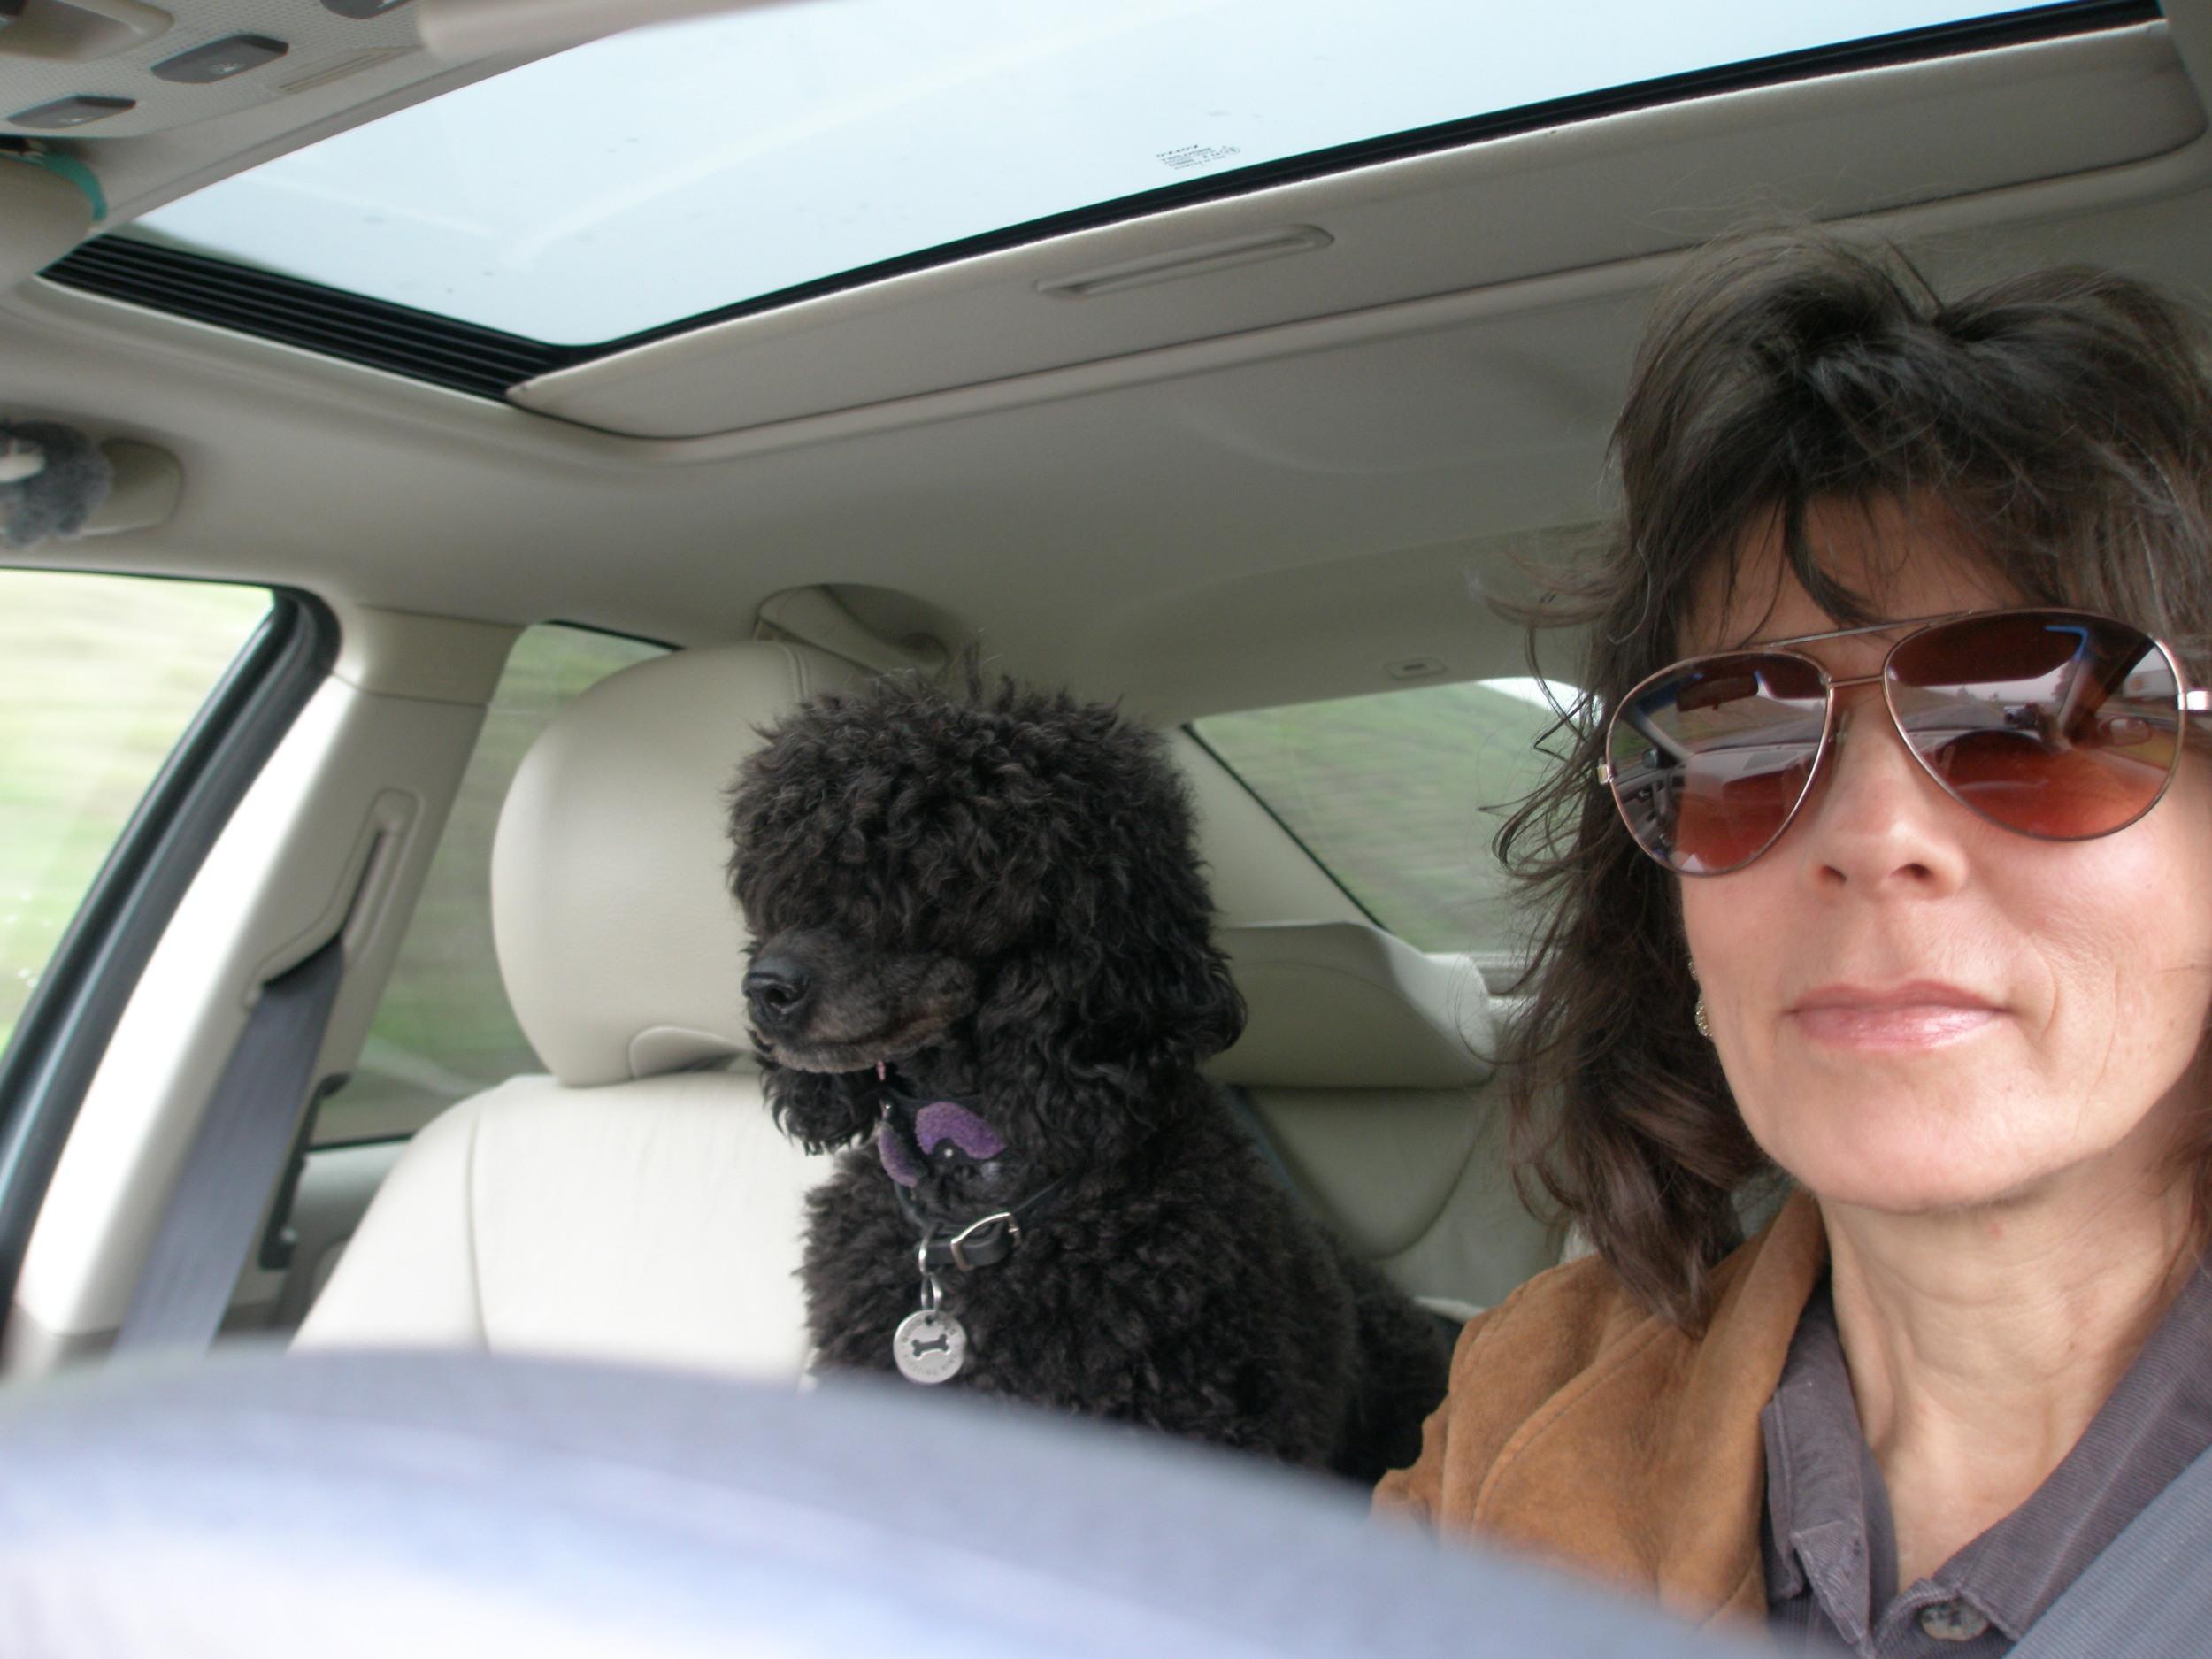 My partner; Yofi the Poodle & I at work.